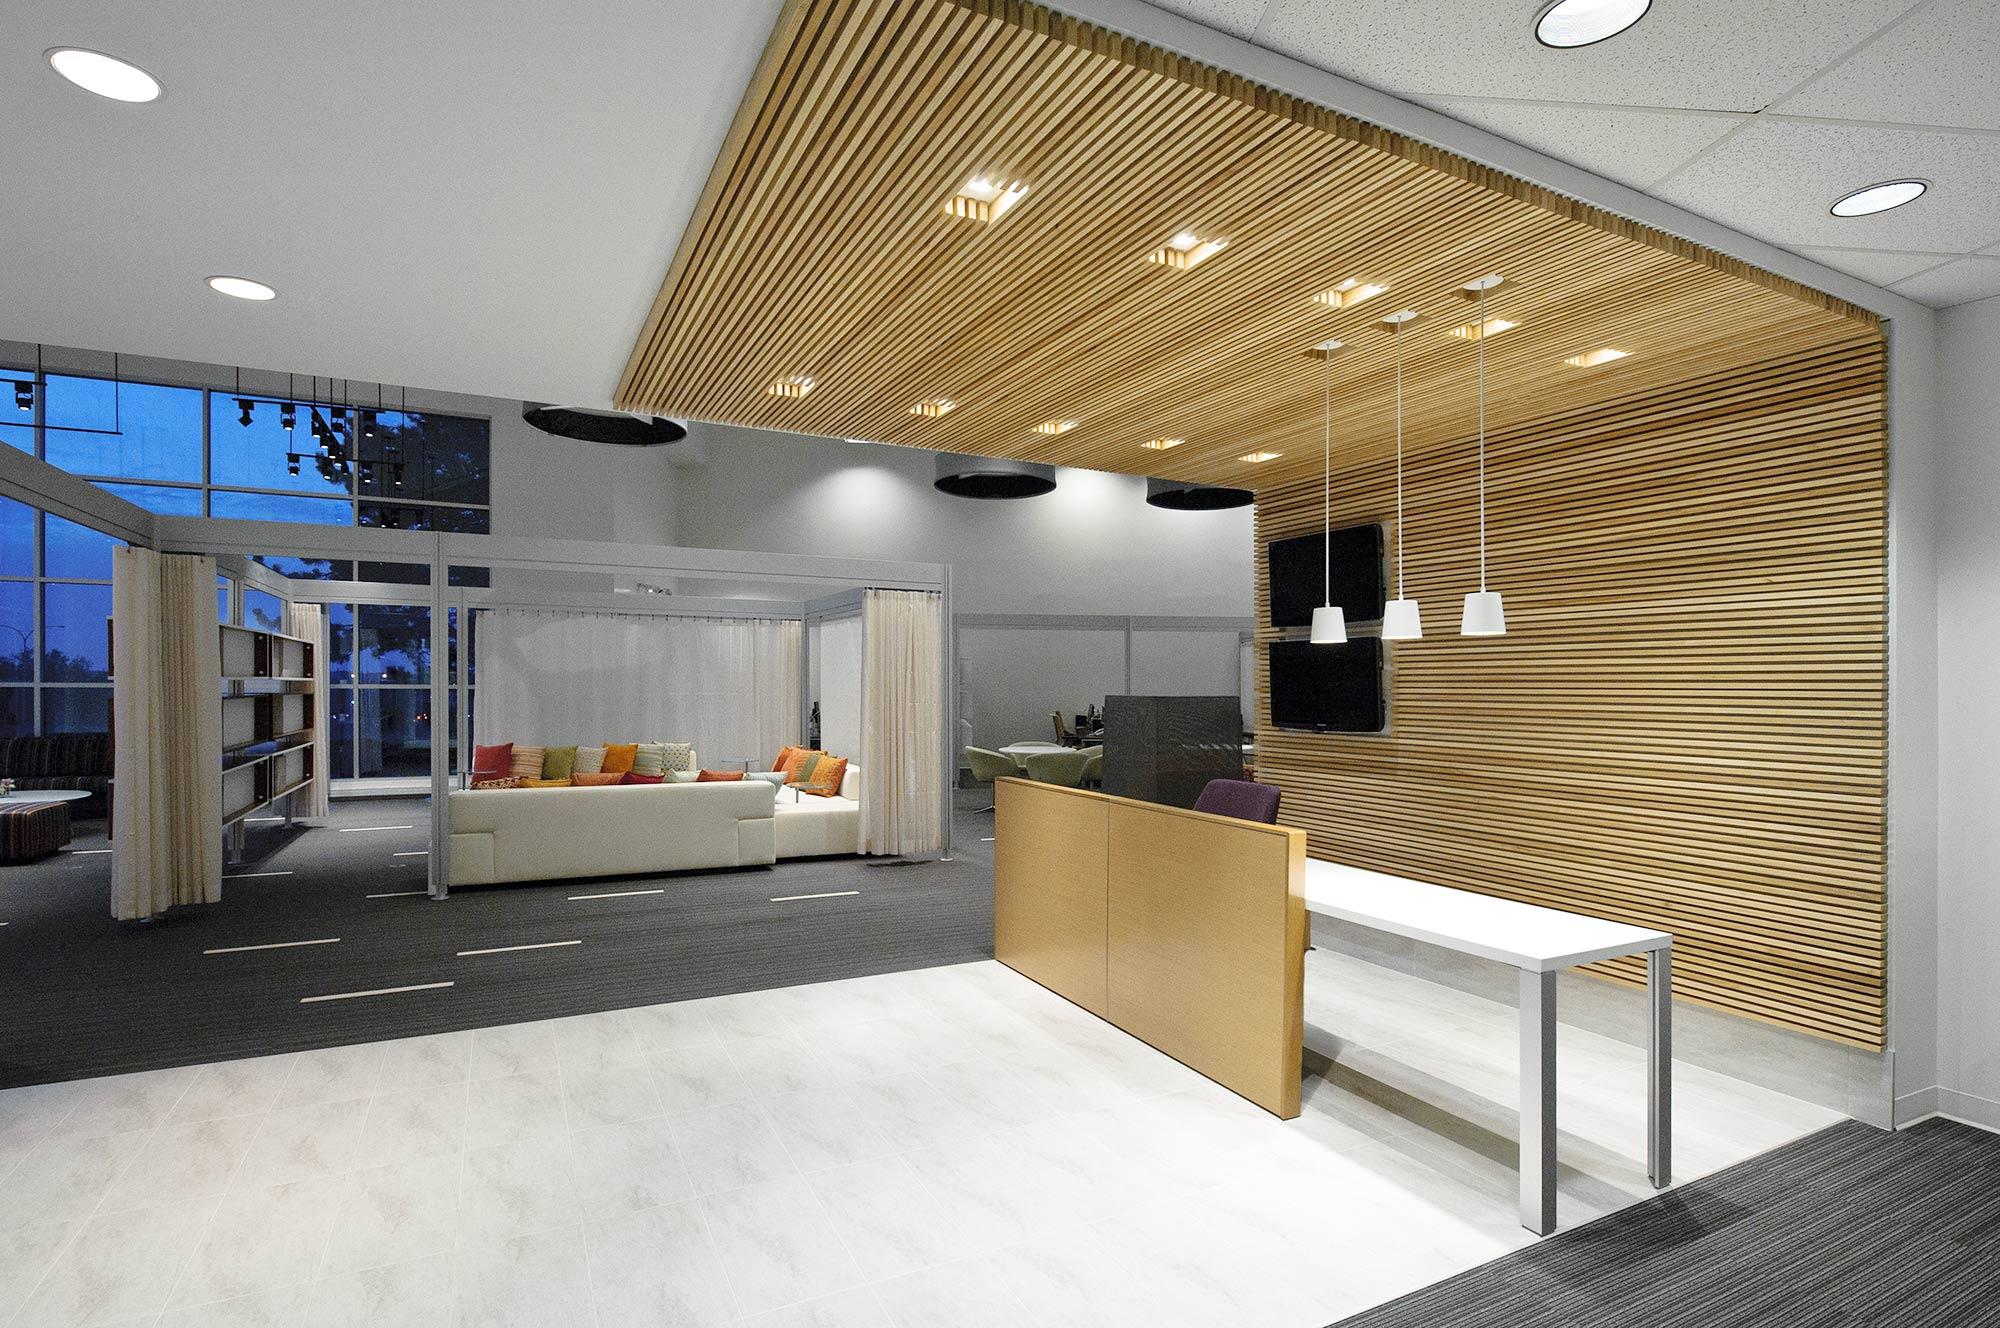 interior-design-furniture-showroom-entry-area.jpg